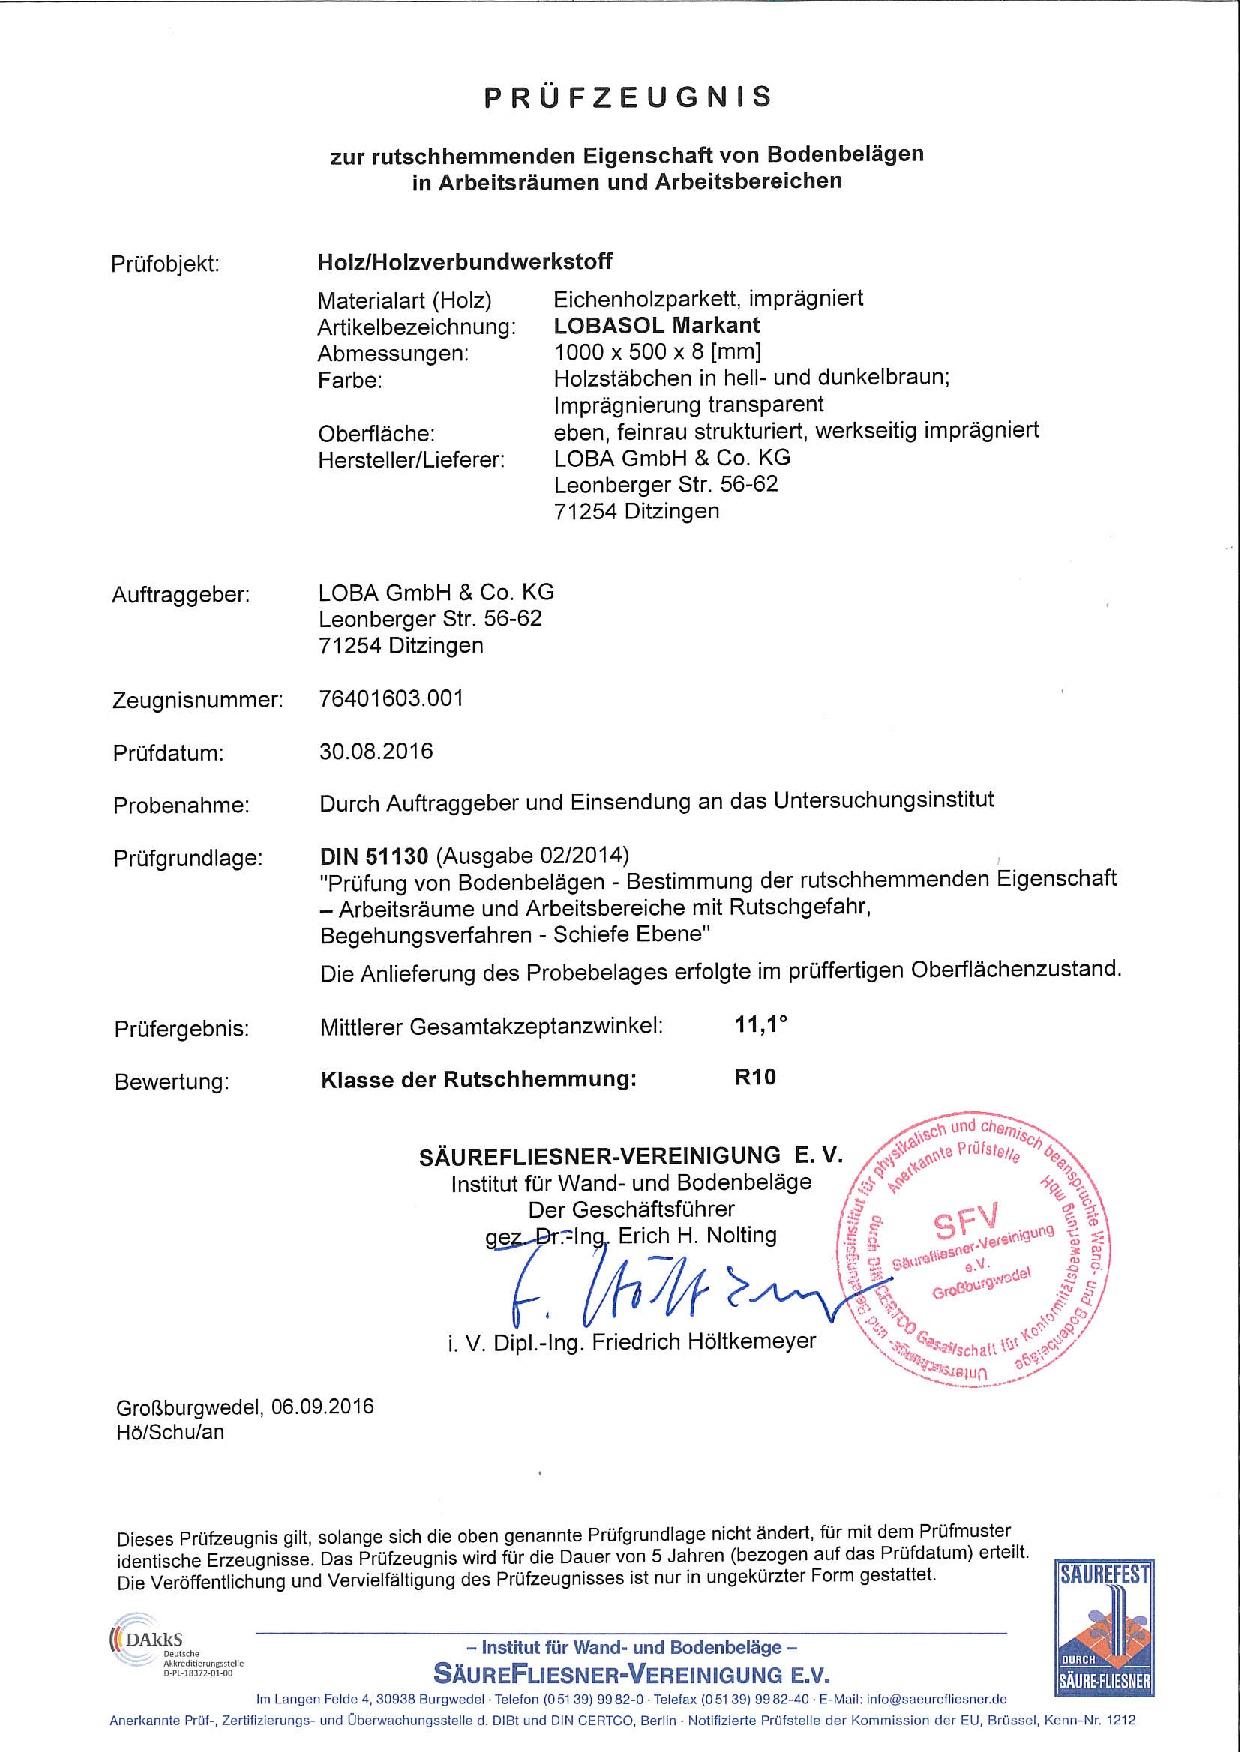 PZ_DE_10508_BGR_181_R10_Holz_LOBASOL_Markant